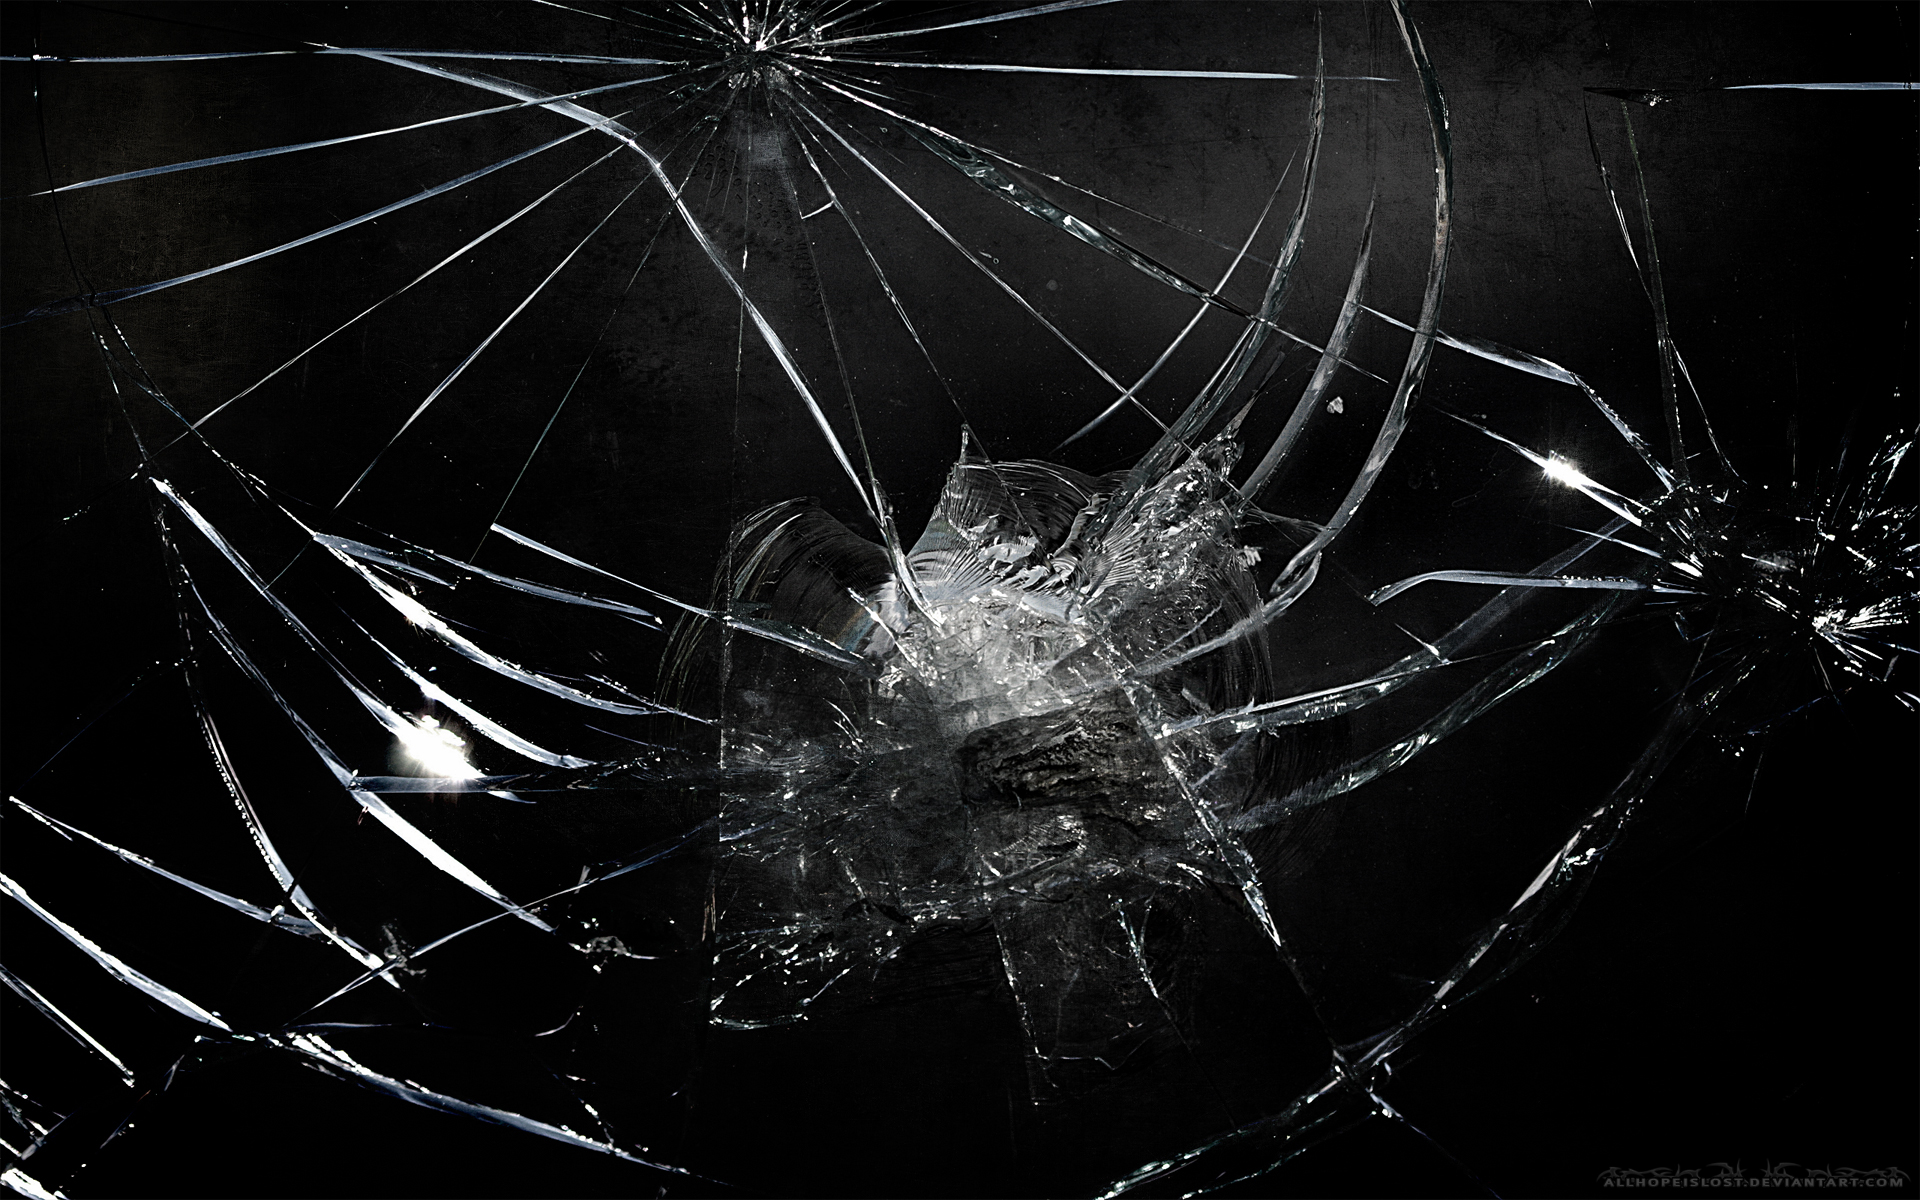 3d Wallpapers Buy Online 45 Realistic Cracked And Broken Screen Wallpapers